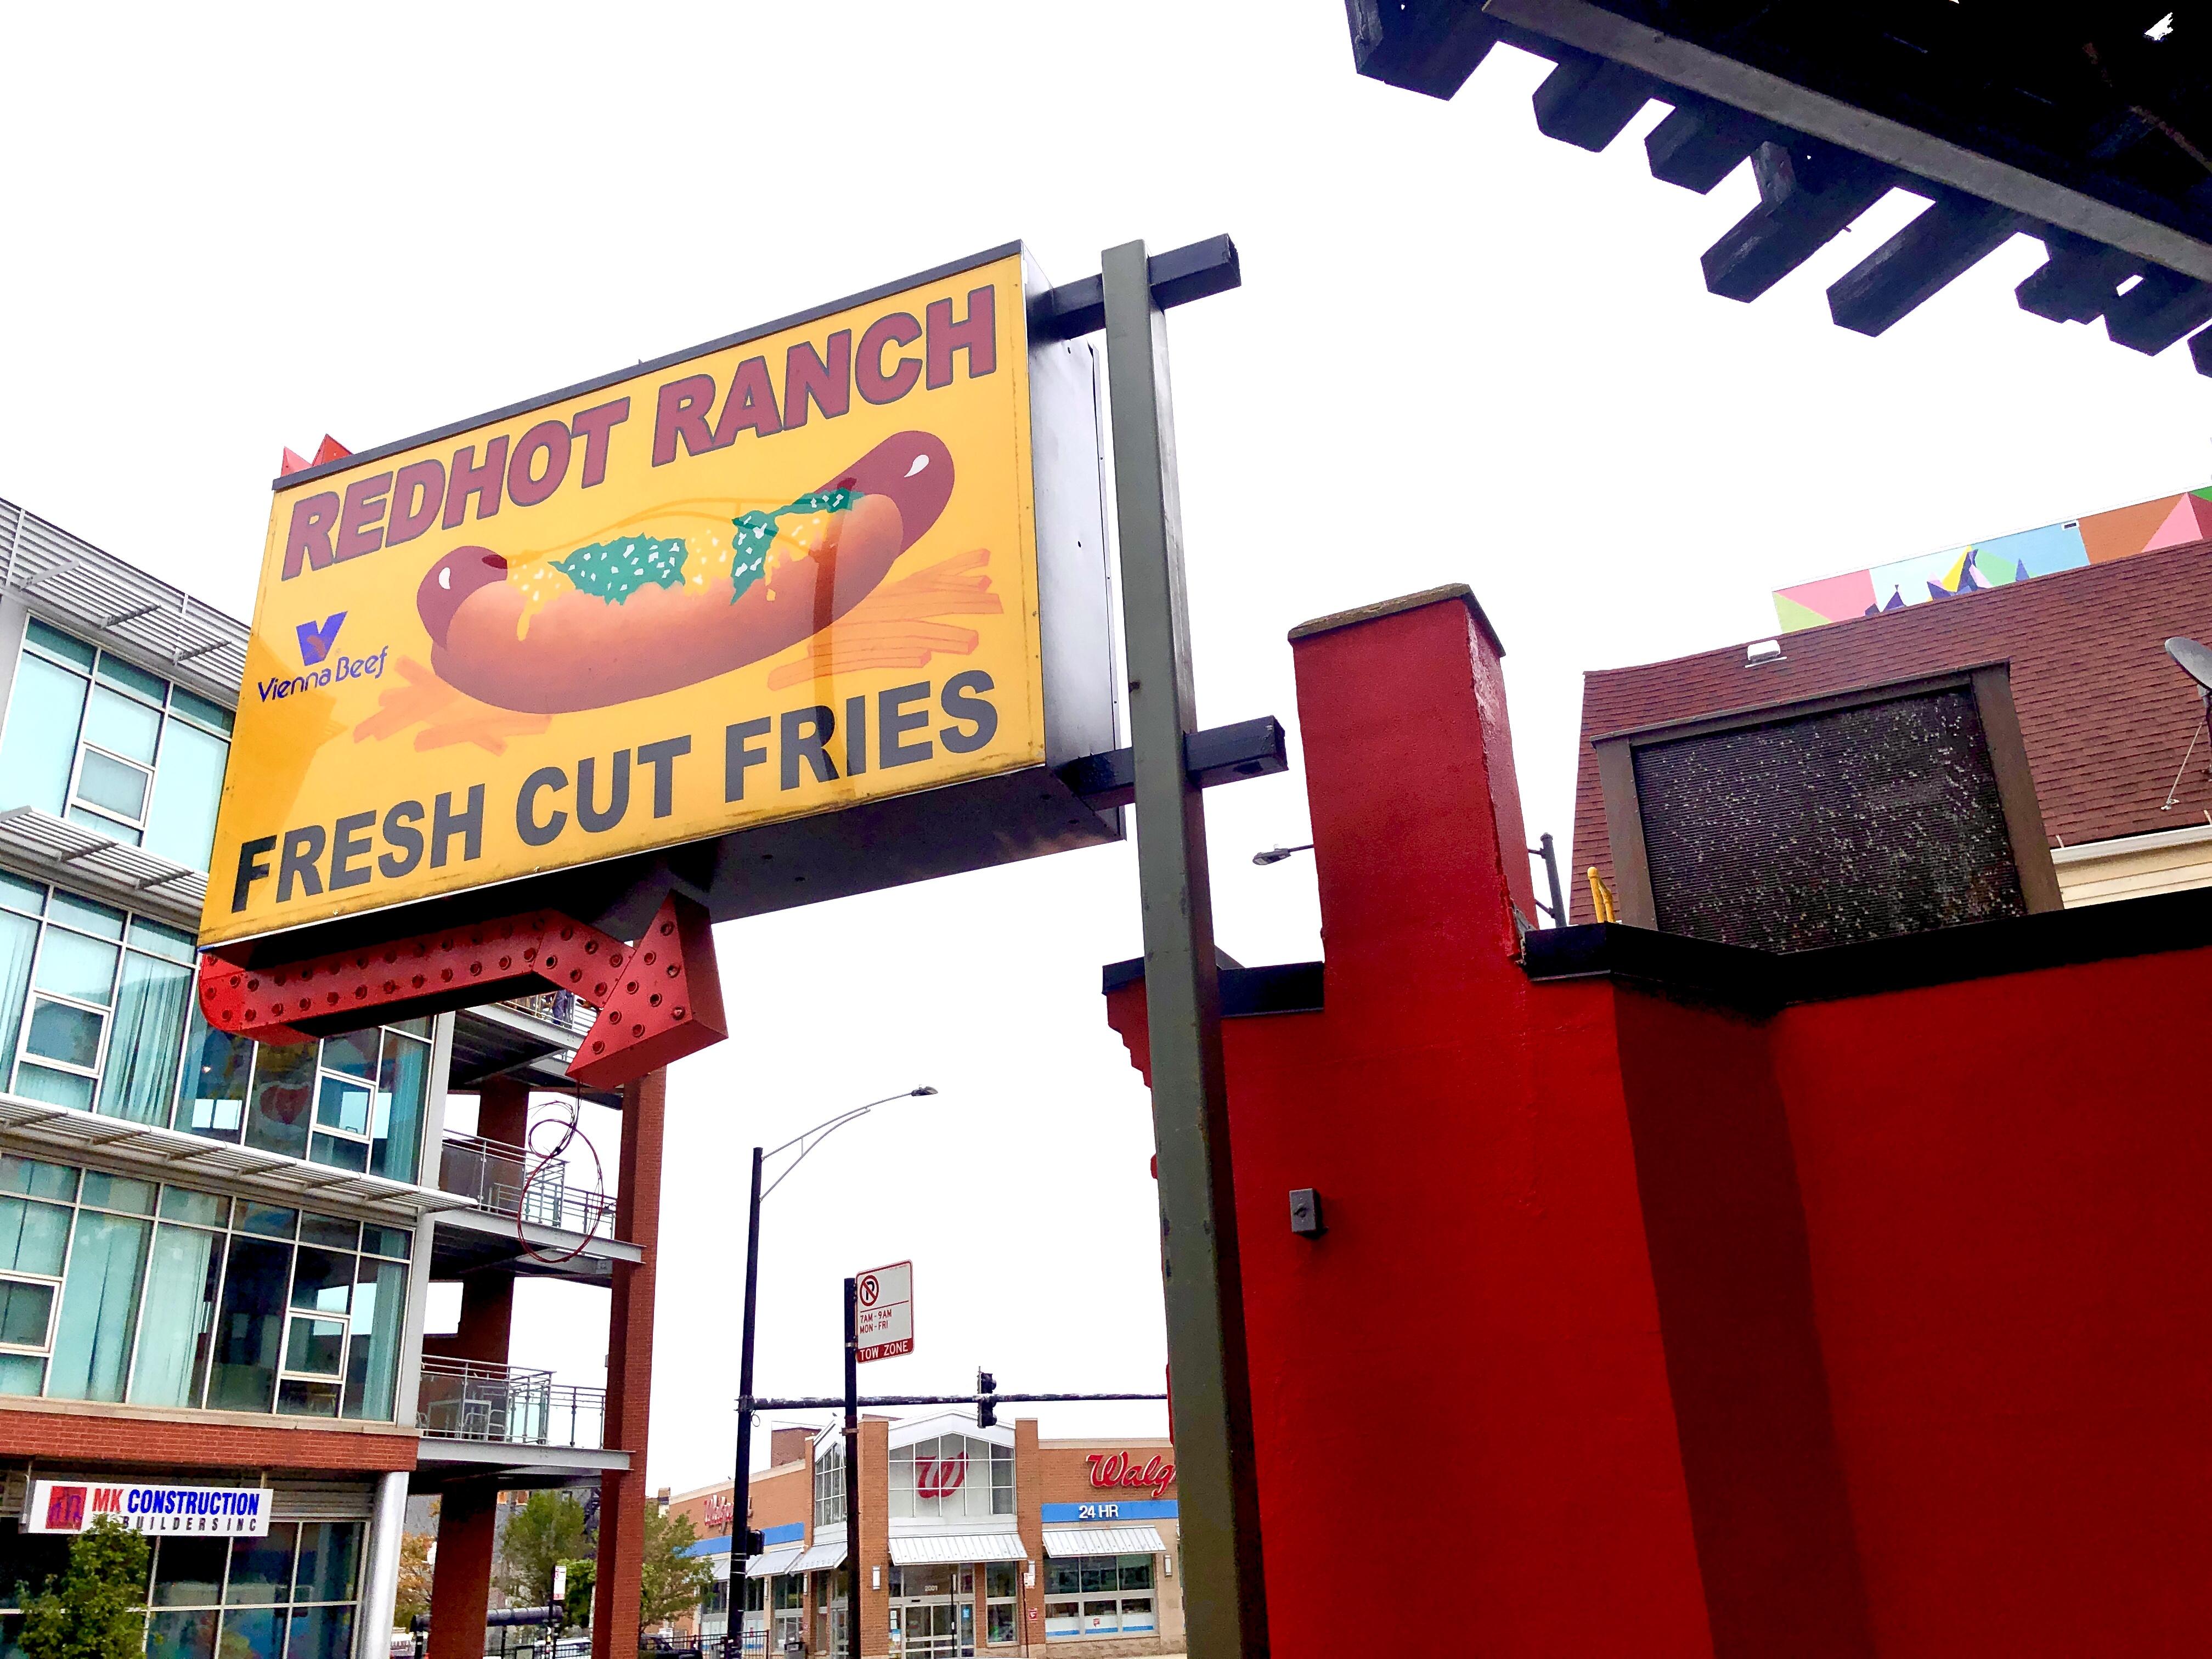 A sign depicting a hot dog.